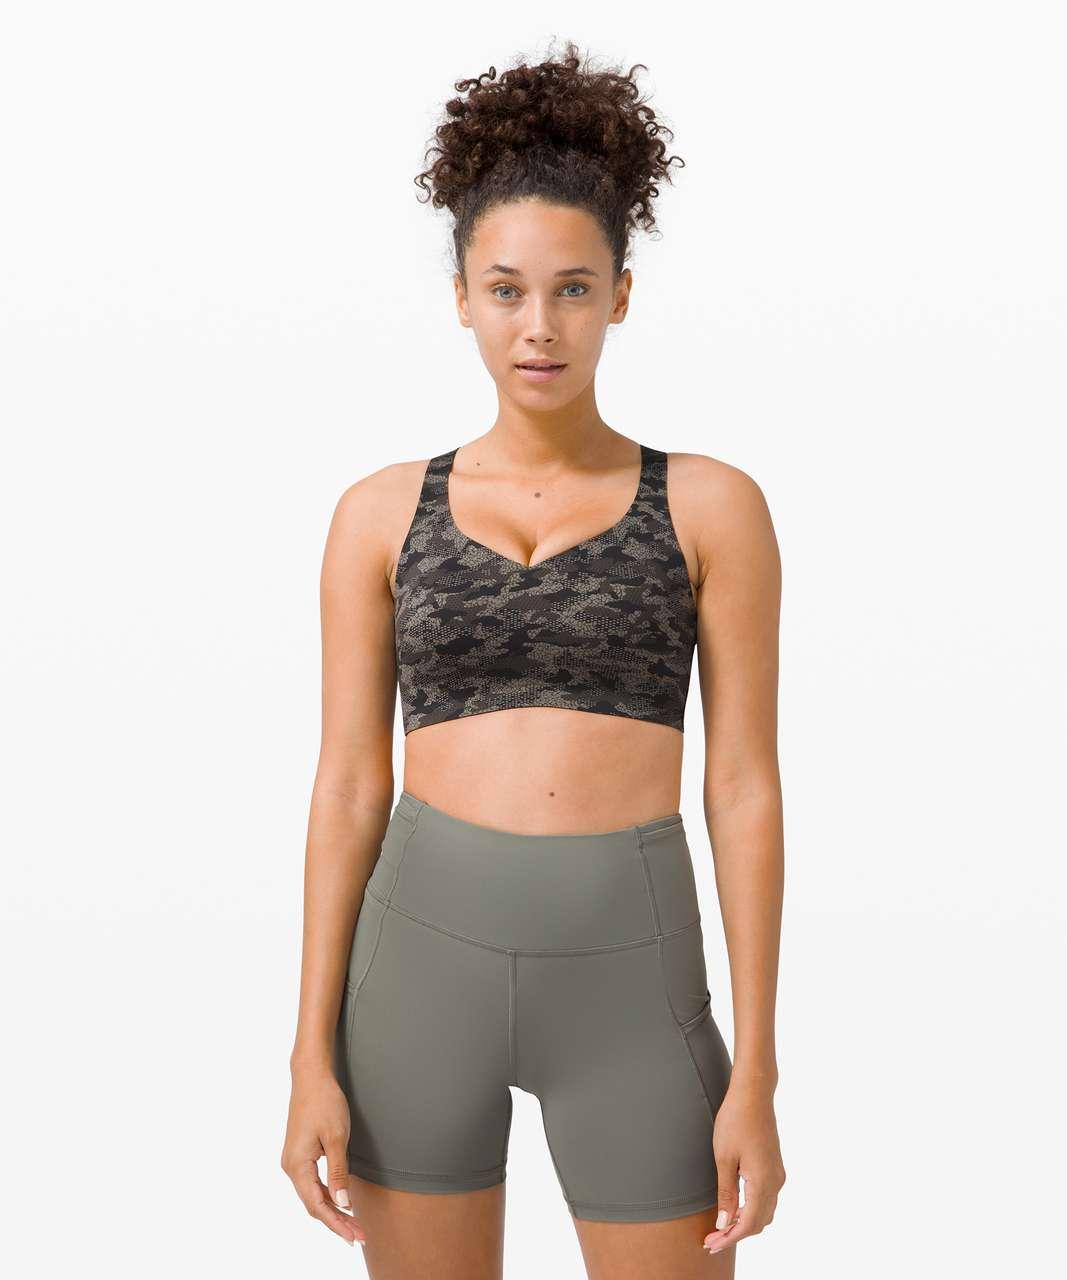 Lululemon Enlite Bra Weave *High Support, A–E Cup - Collage Camo Mini Black Multi